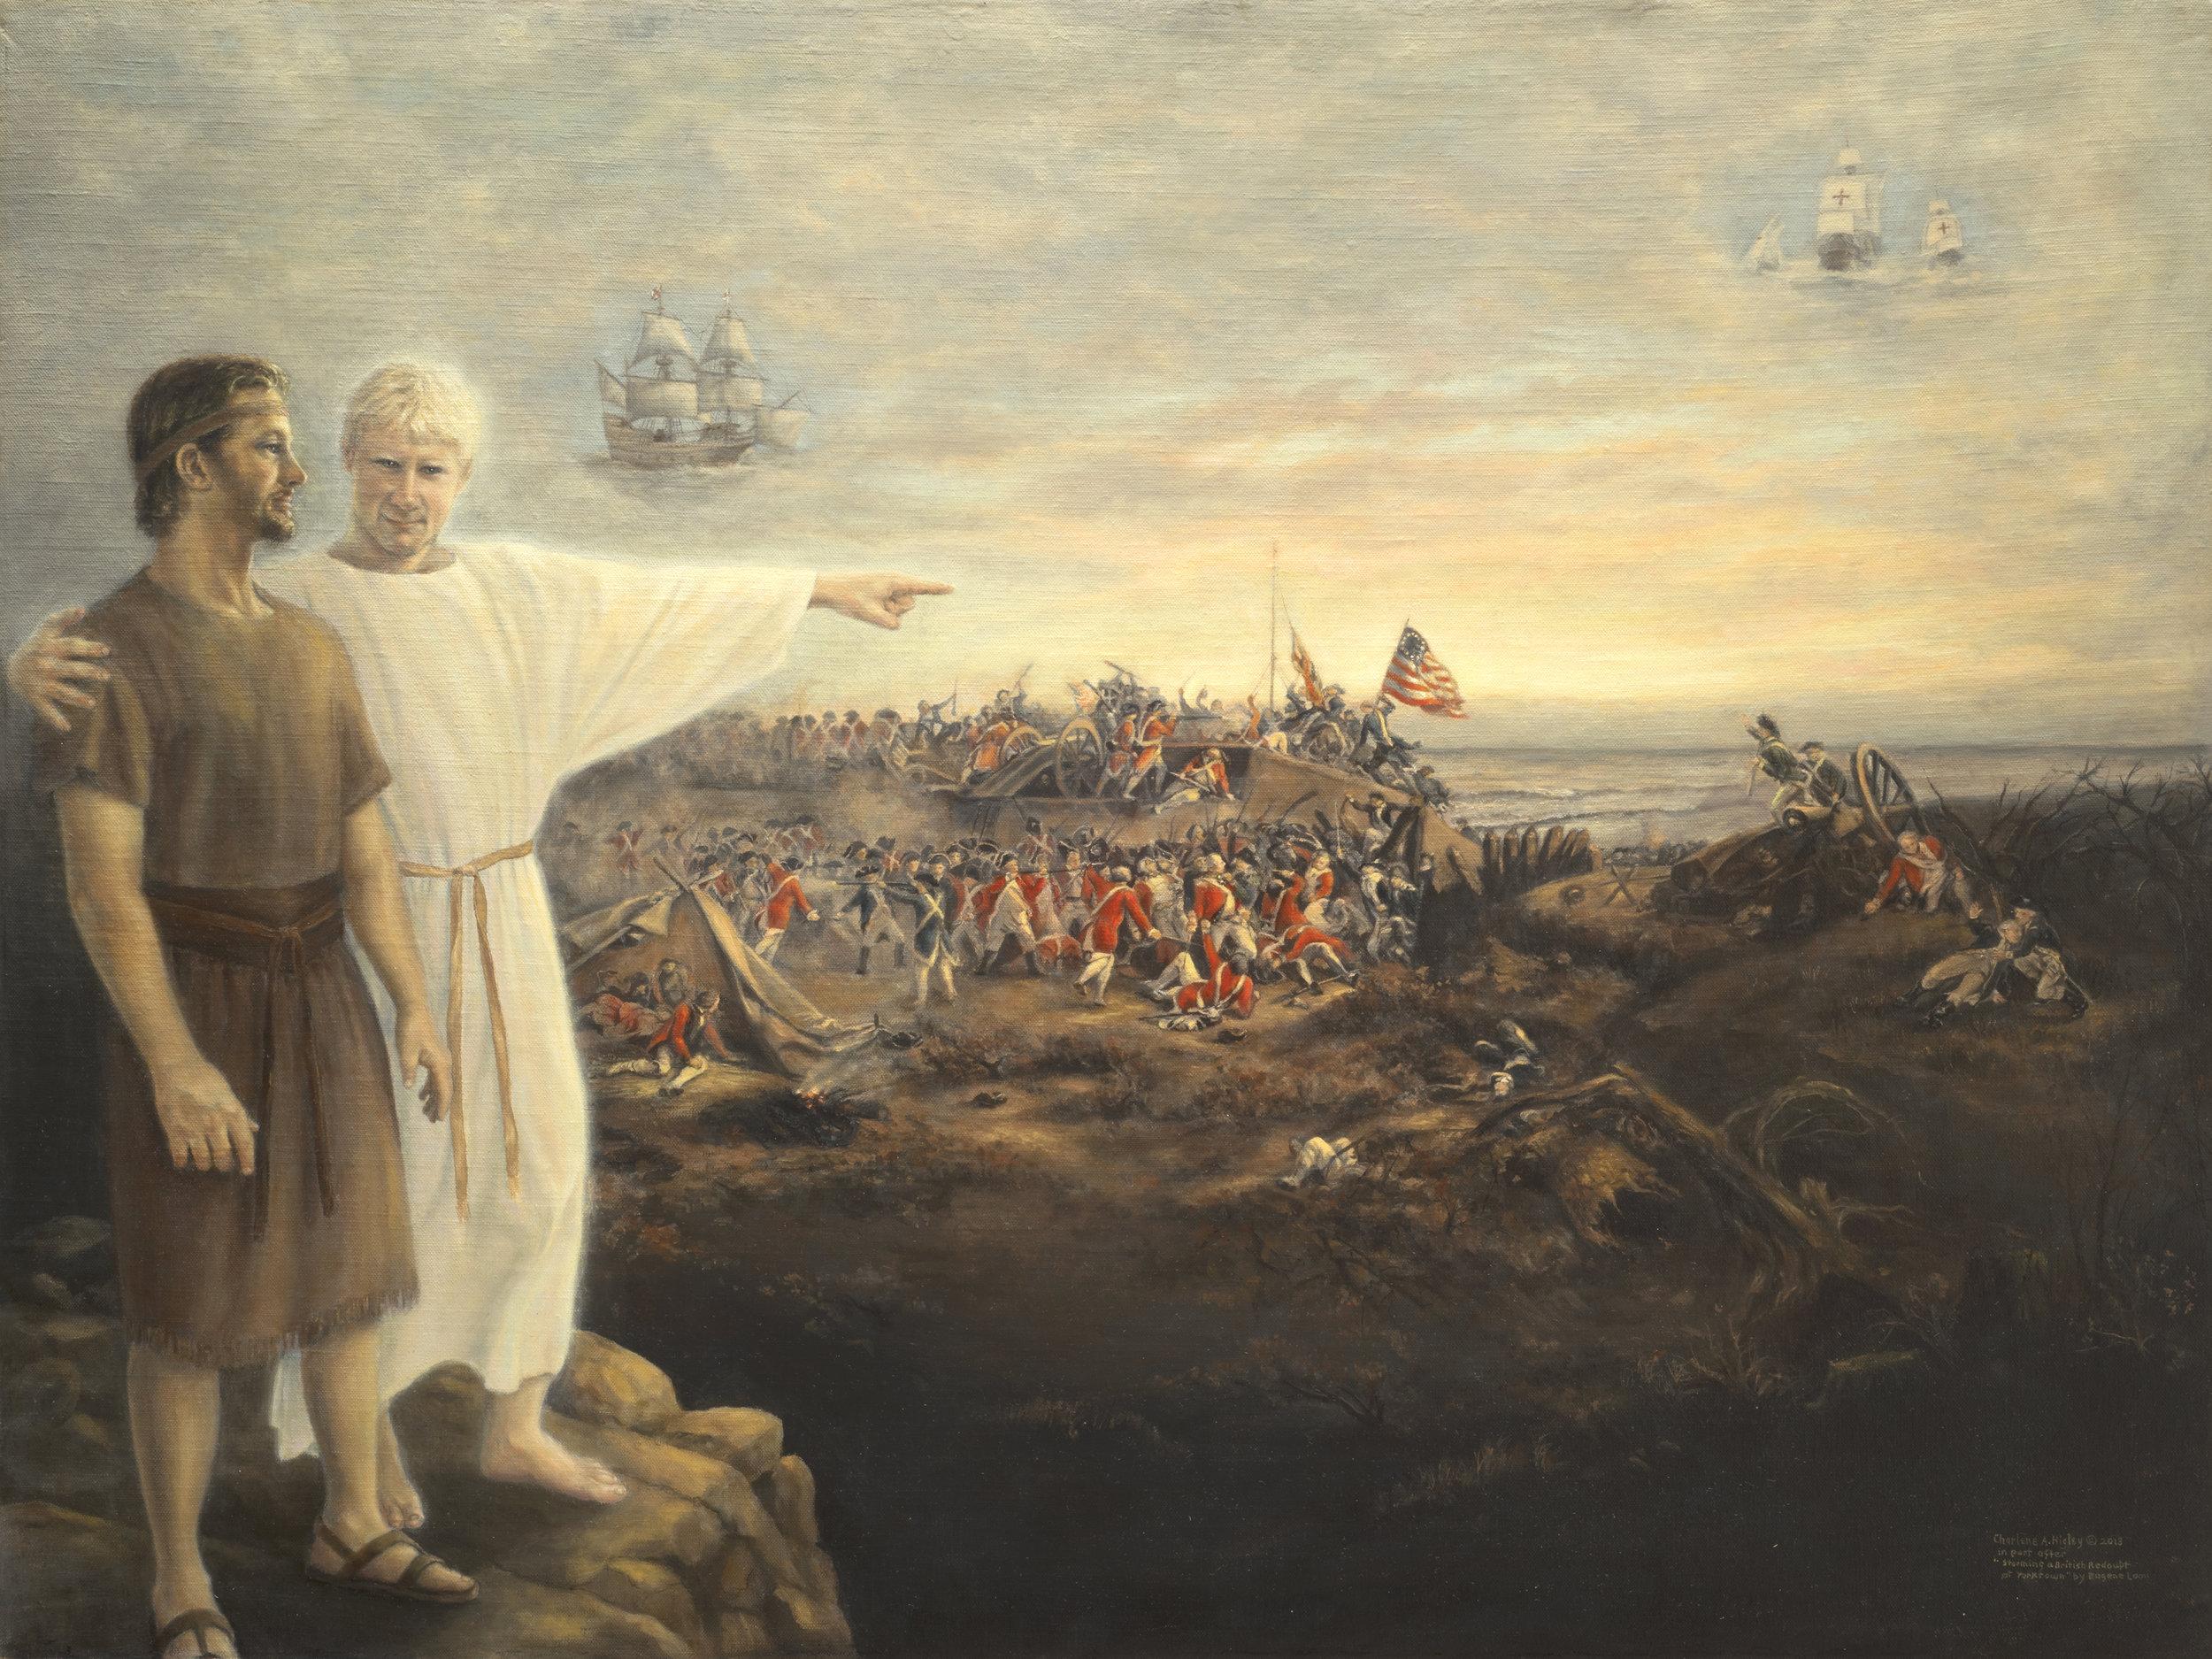 The Book of Mormon19